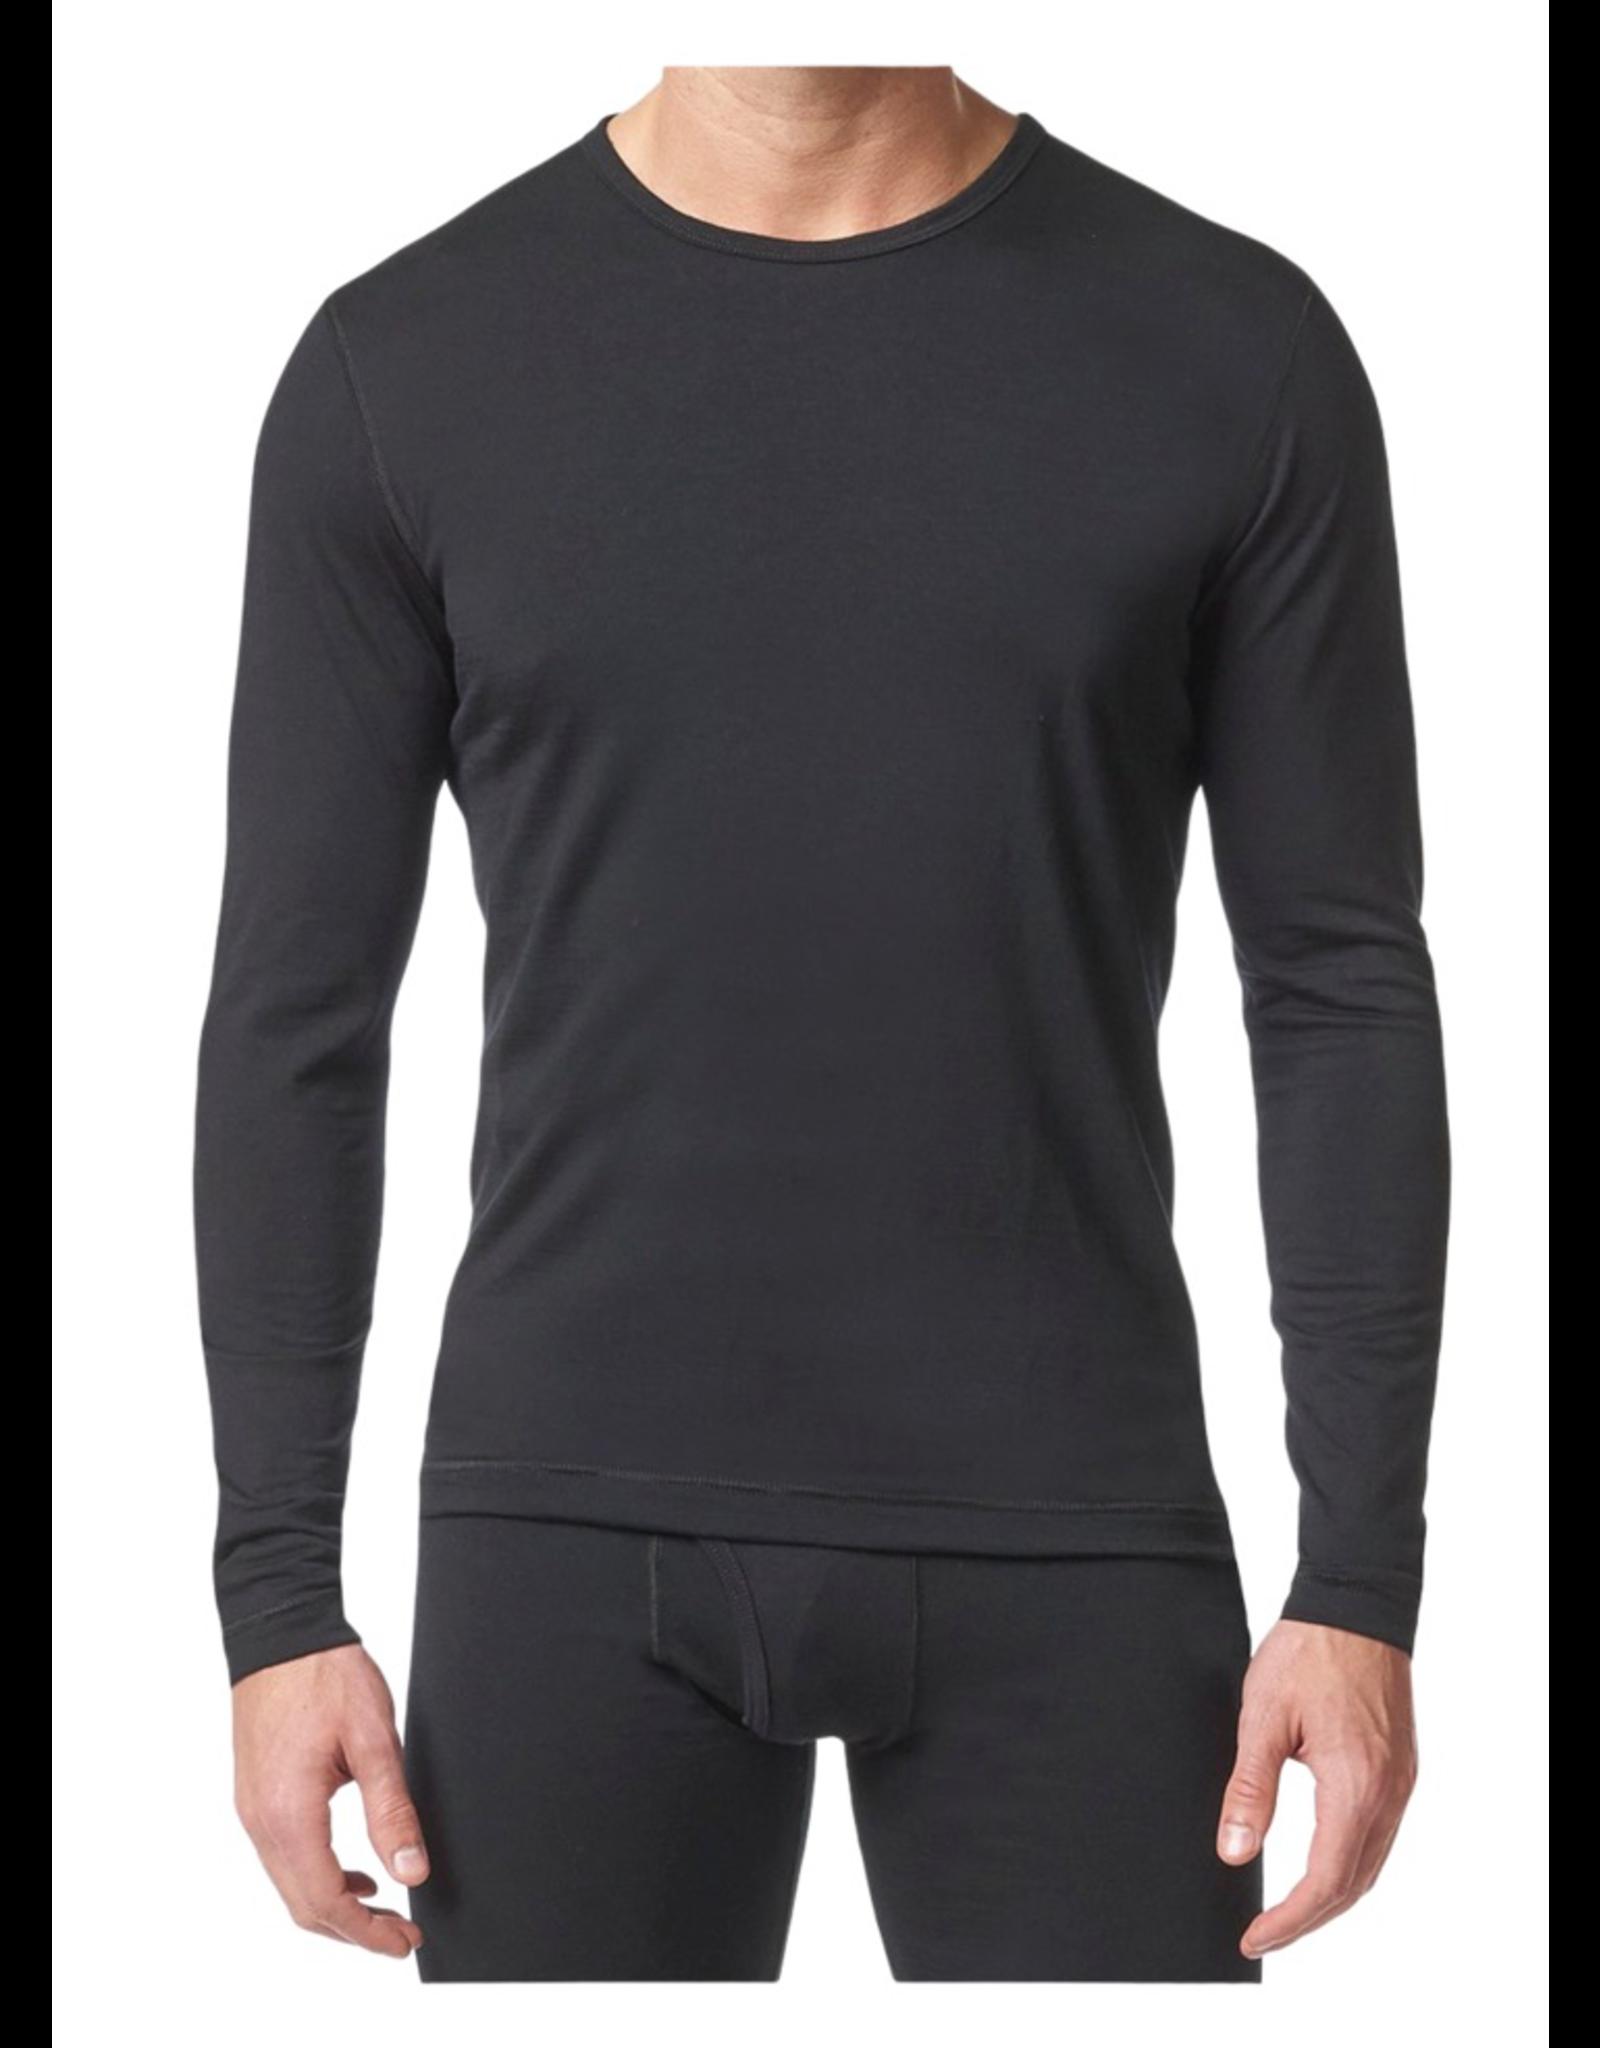 Stanfield's Stanfield's Men's Merino Wool Base Layer Top